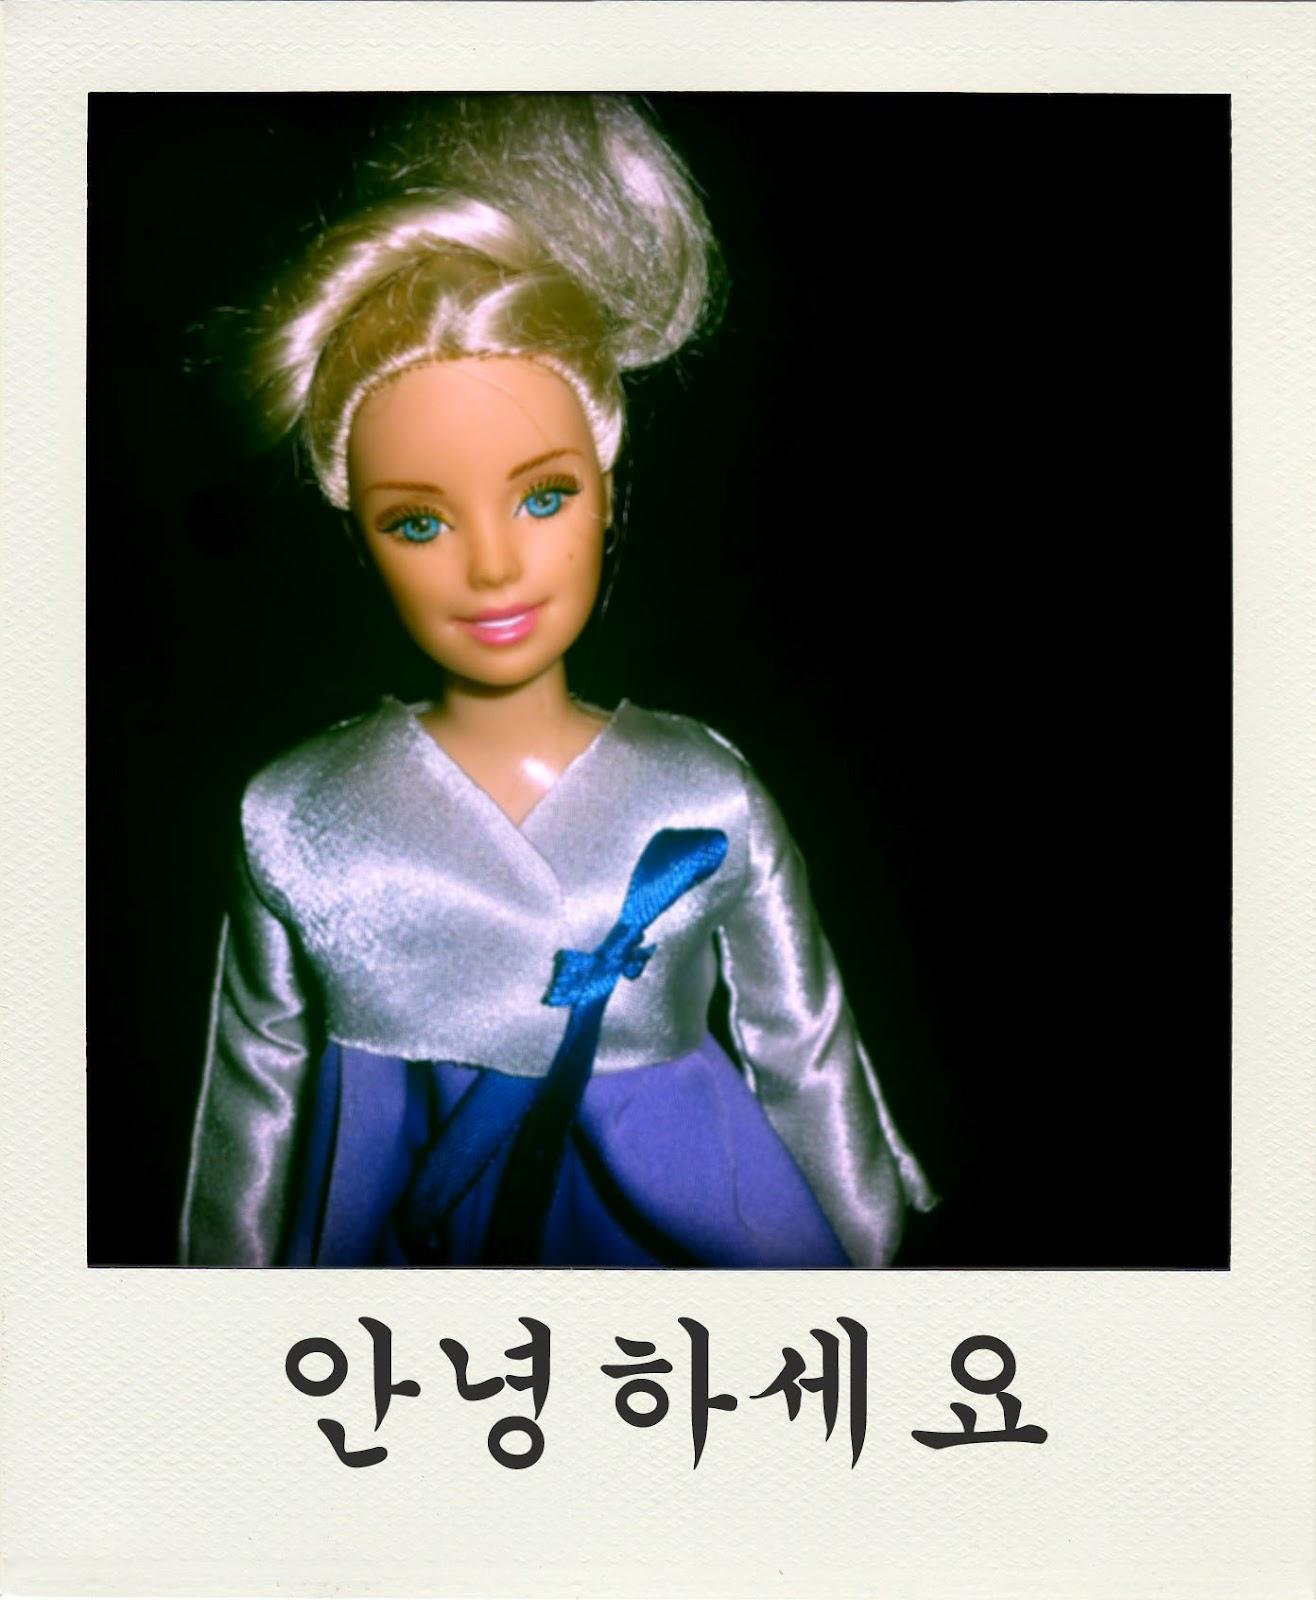 Cara Buat Anak Patung Comel Lulu Anak Patung Hidup